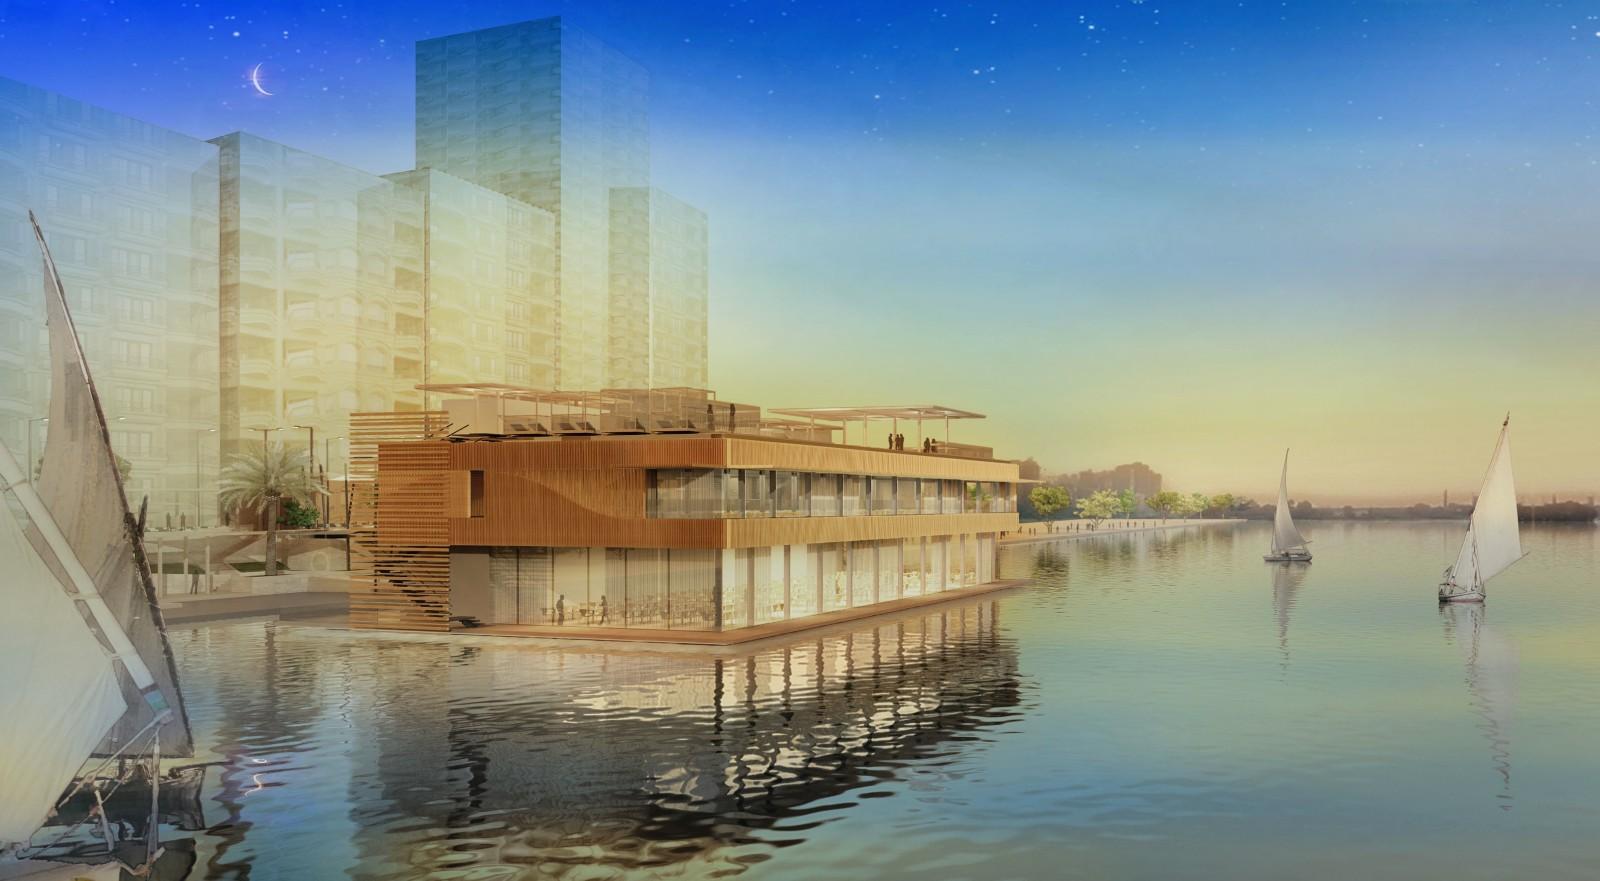 The Nile Boat